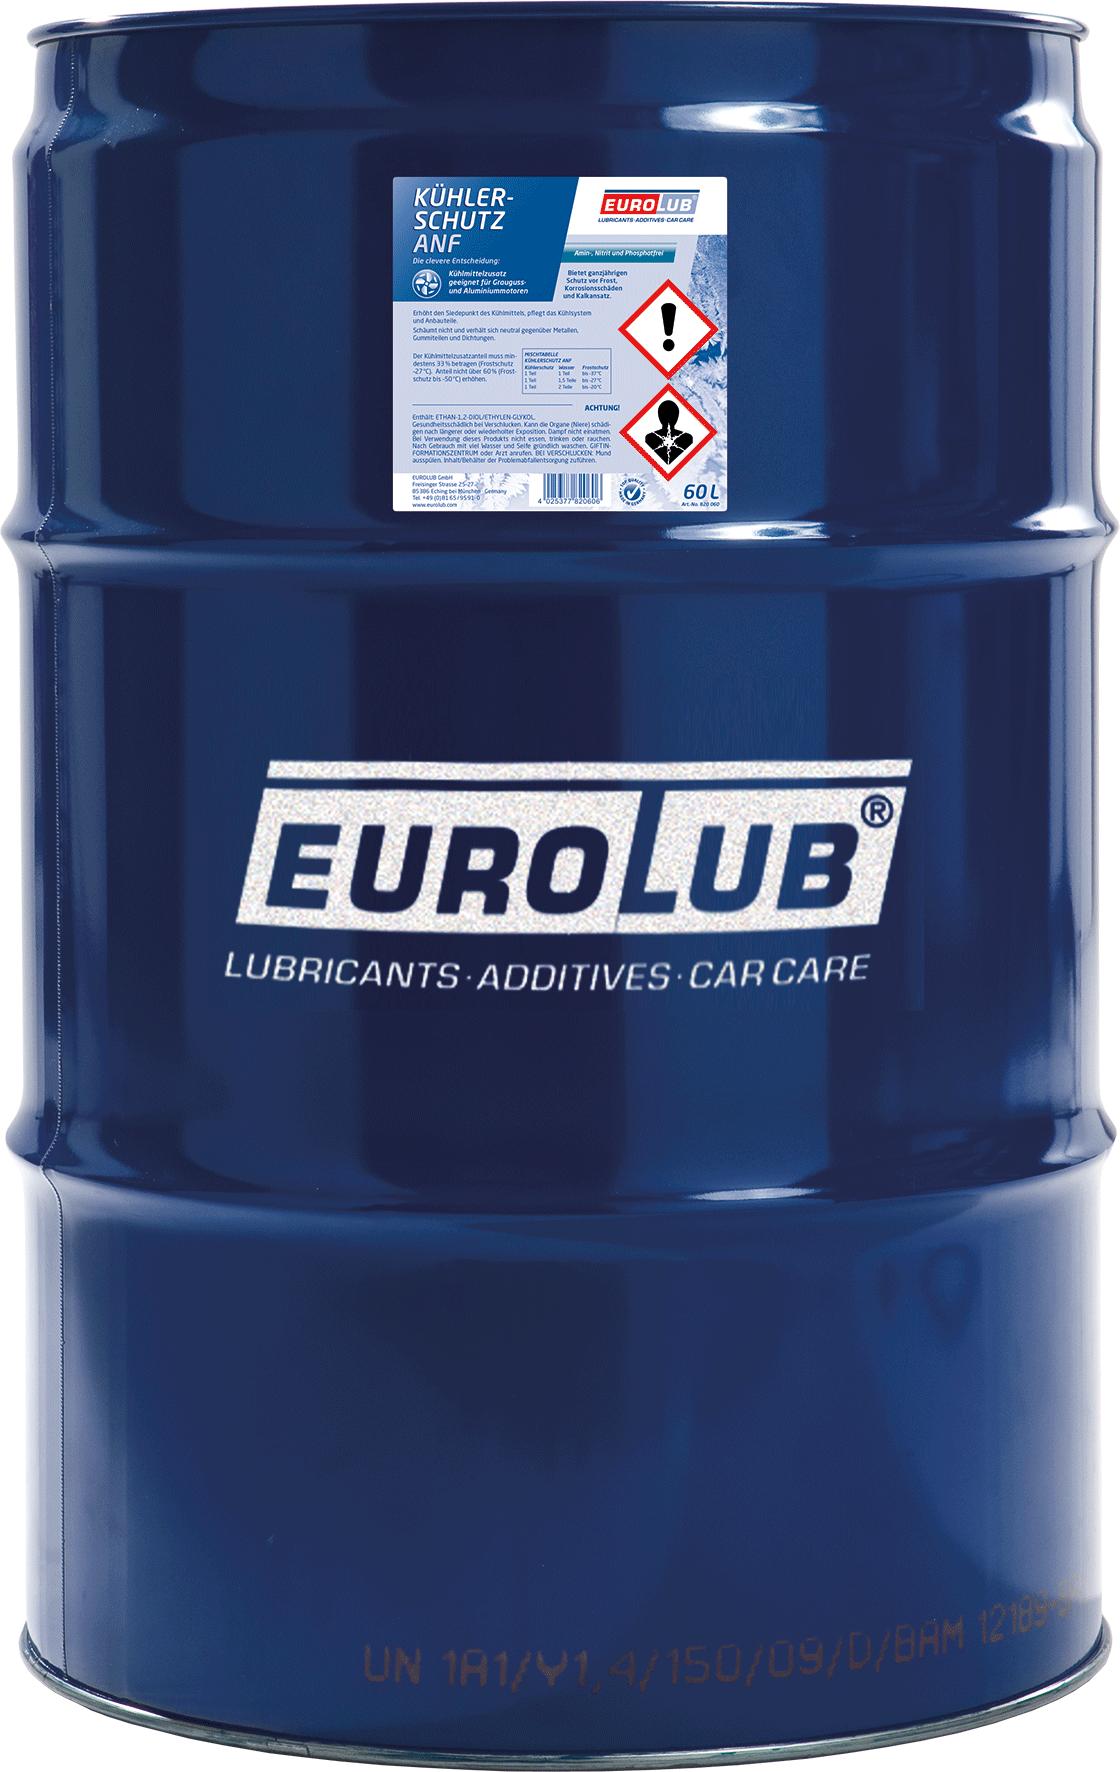 EUROLUB Kuhlerschutz ANF, 60л